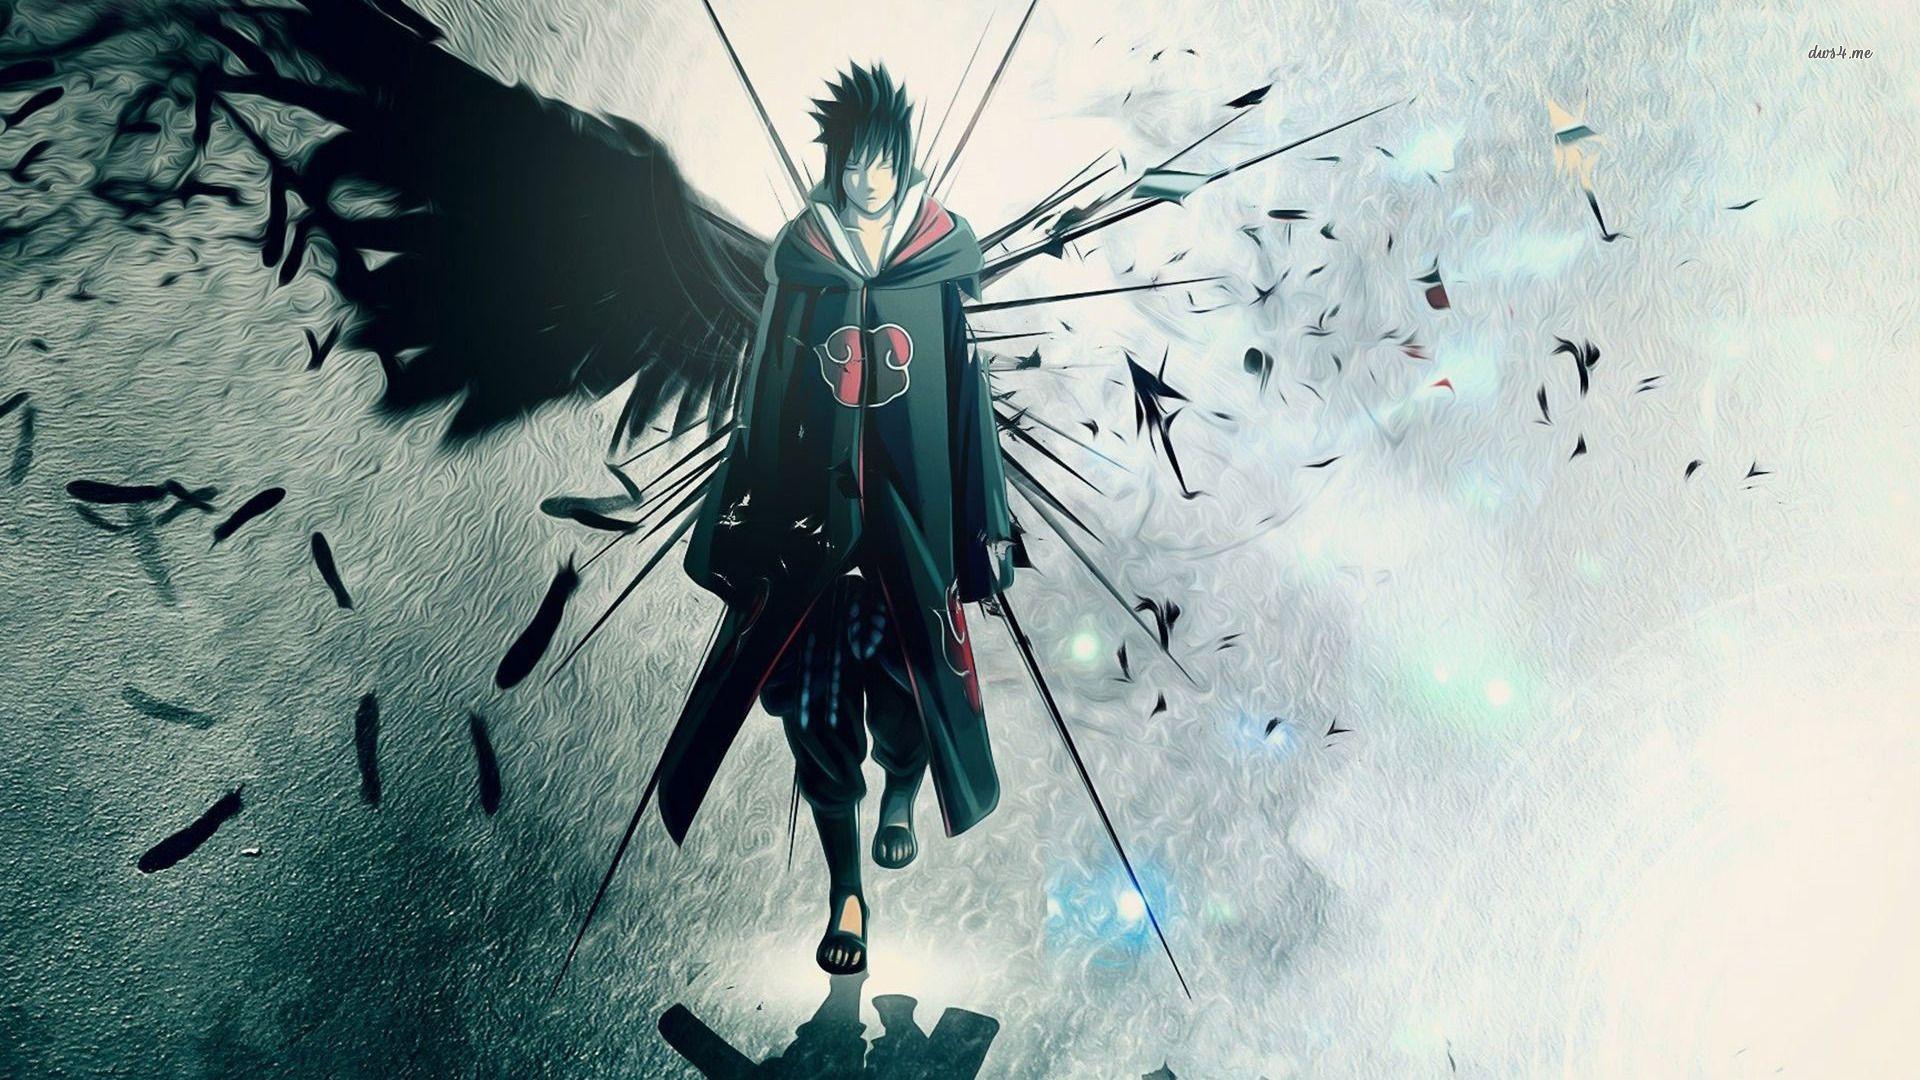 Image for 4K Naruto Wallpaper Backgrounds 7287t Arte